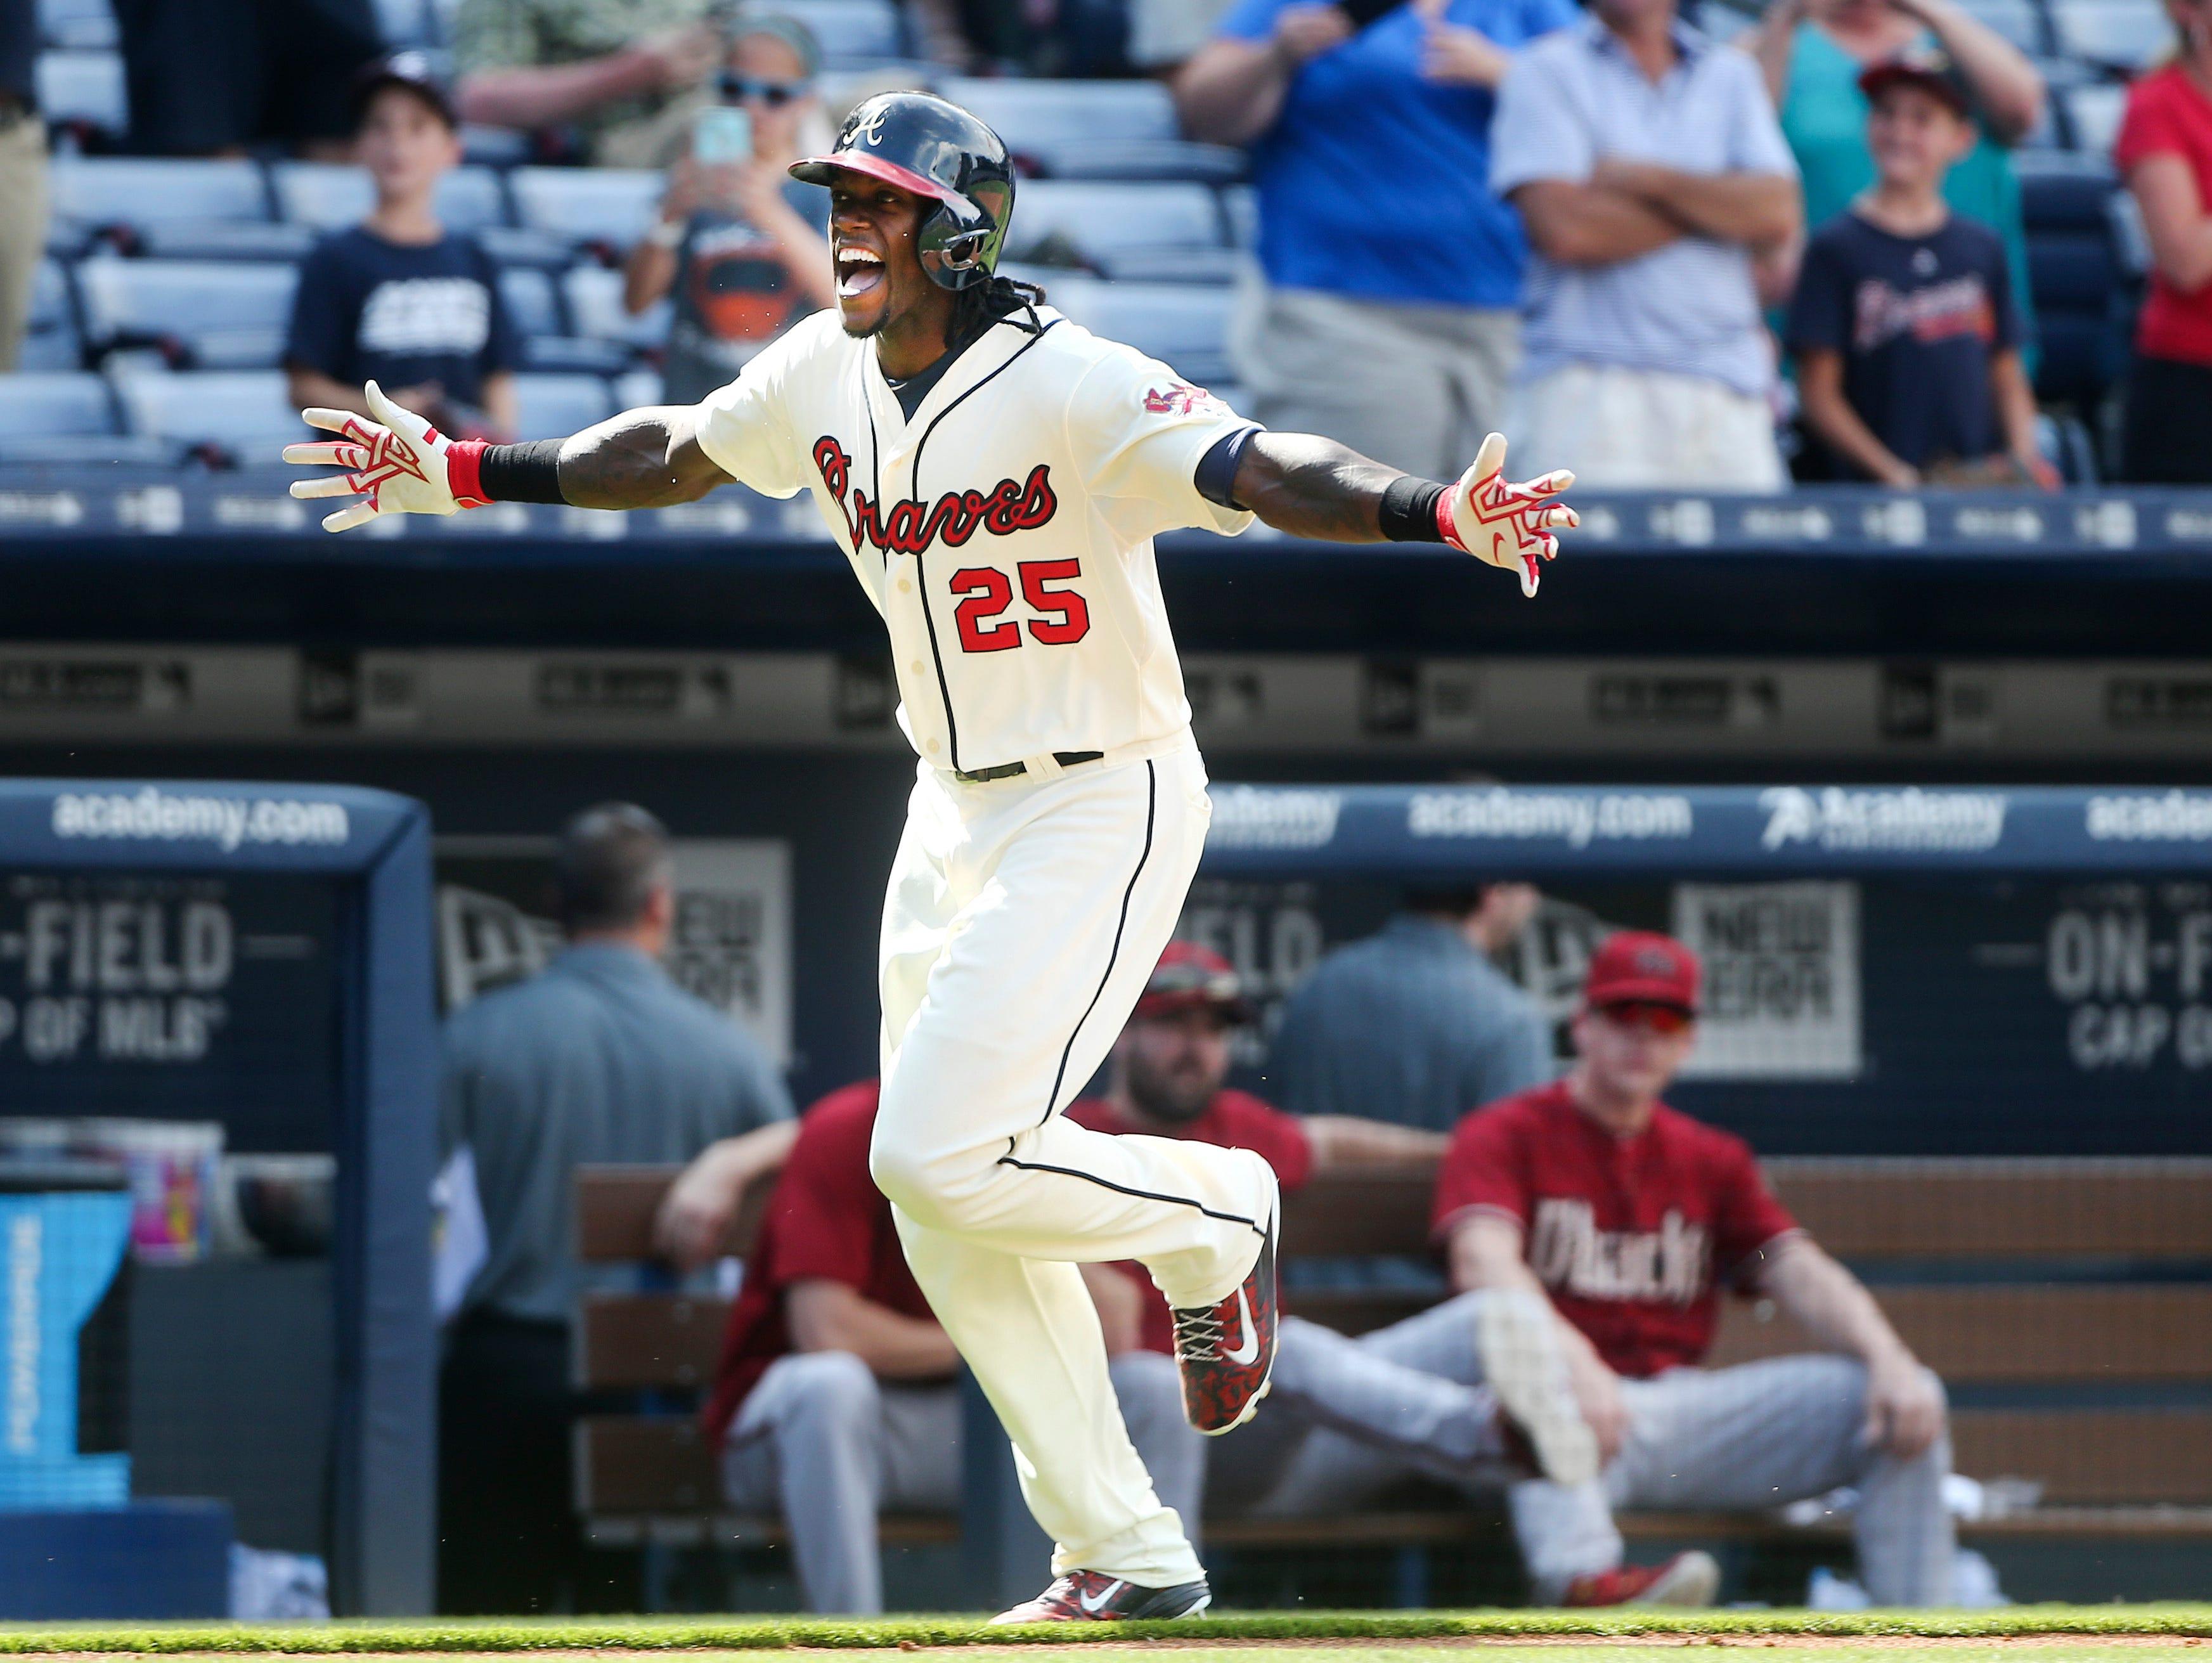 Atlanta Braves outfielder Cameron Maybin is a 2005 Roberson graduate.